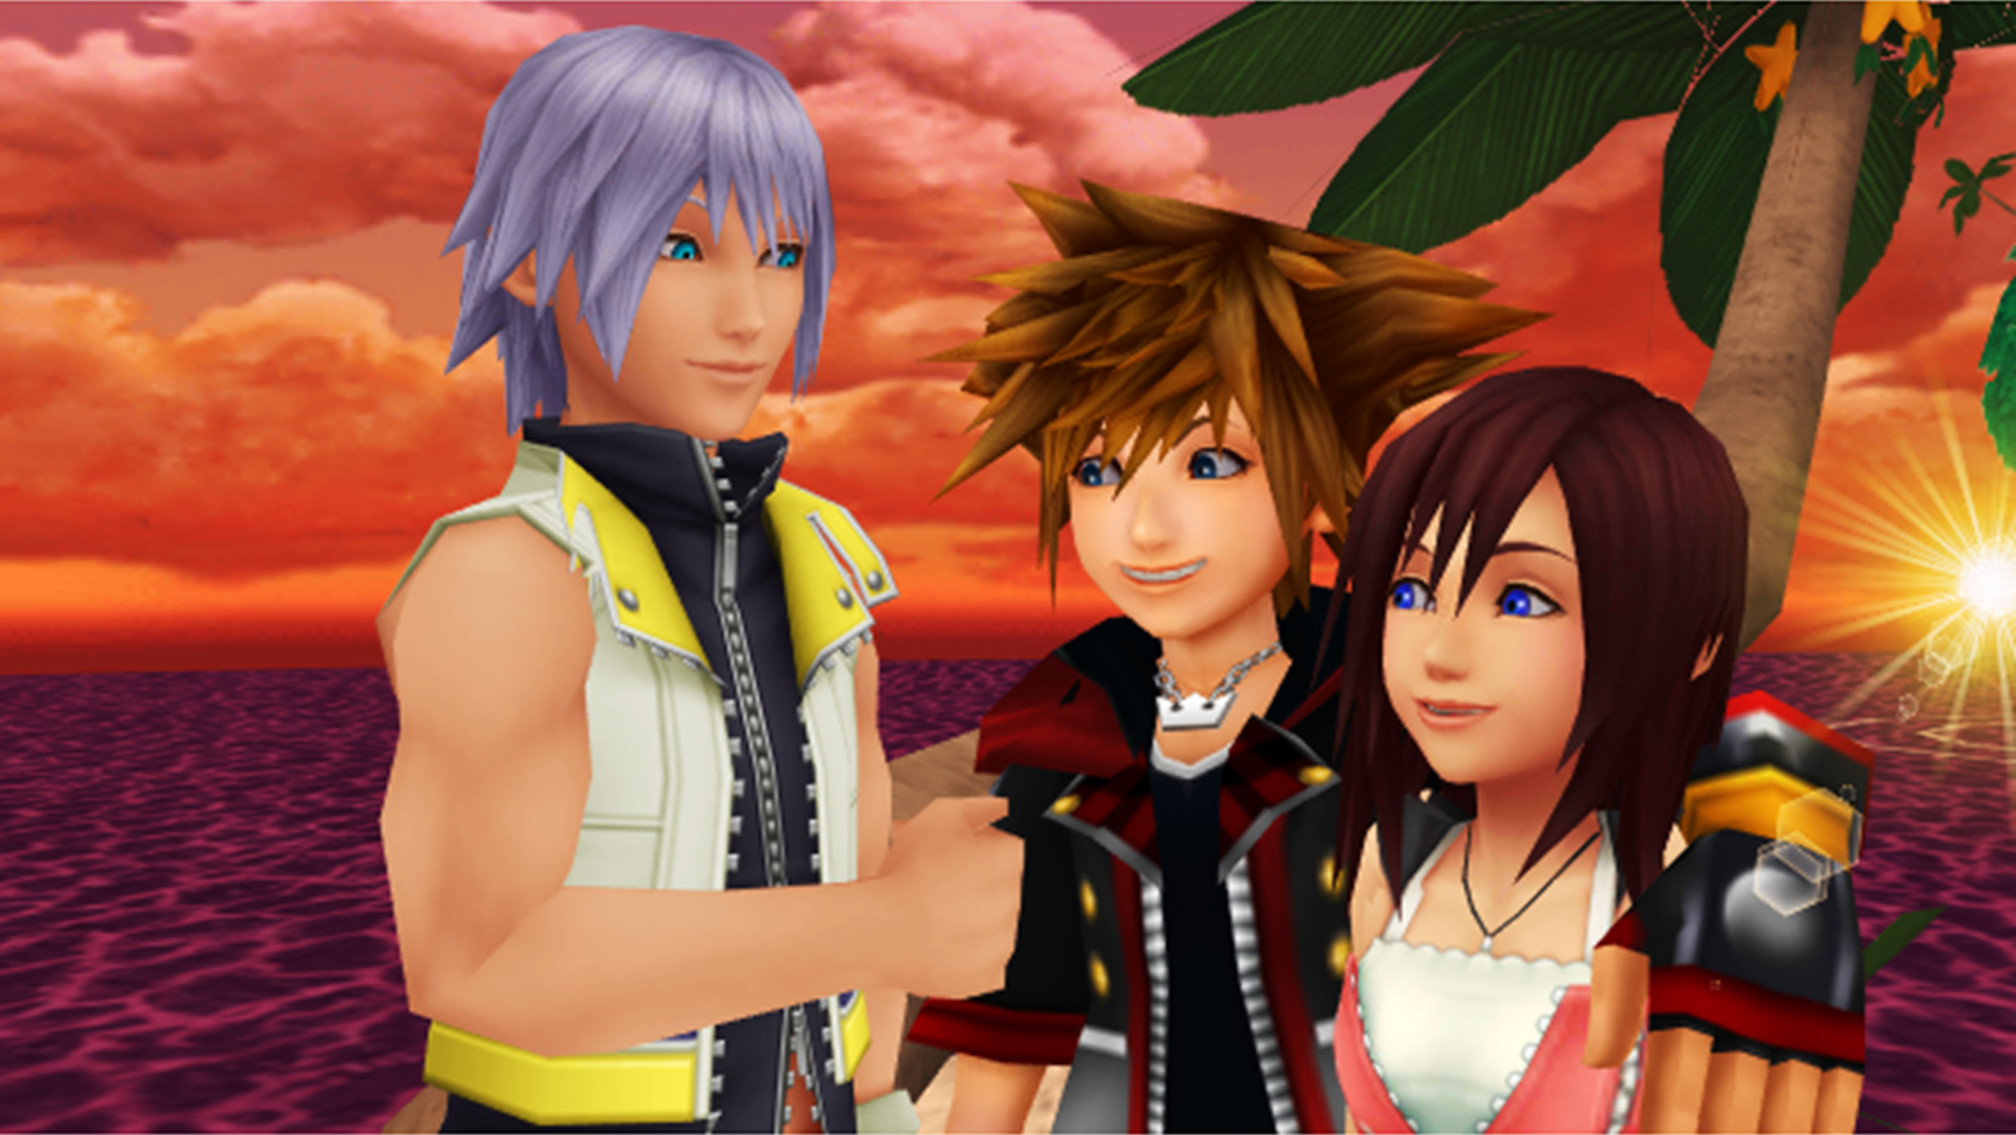 Kingdom Hearts Riku Wallpaper (70+ images)